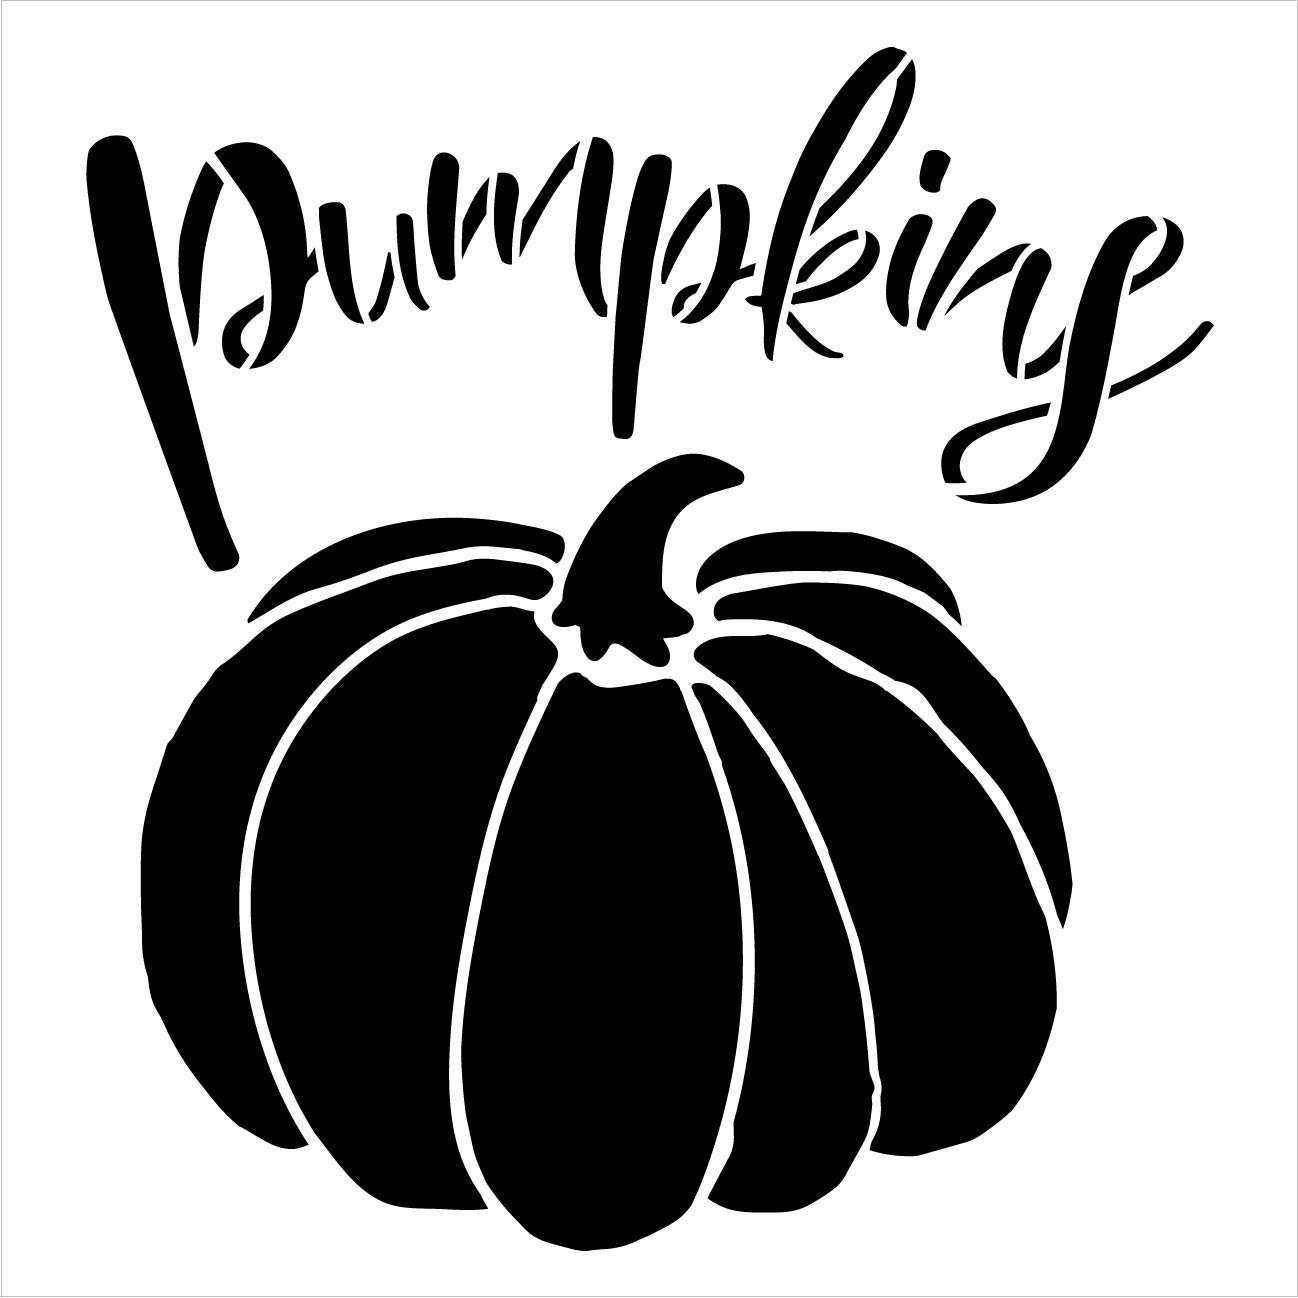 Pumpkins Garden Marker Stencil by StudioR12 | DIY Spring Backyard Outdoor Home Decor | Vegetable Plant Label | Craft & Paint Rustic Wood Signs | Reusable Mylar Template | Select Size